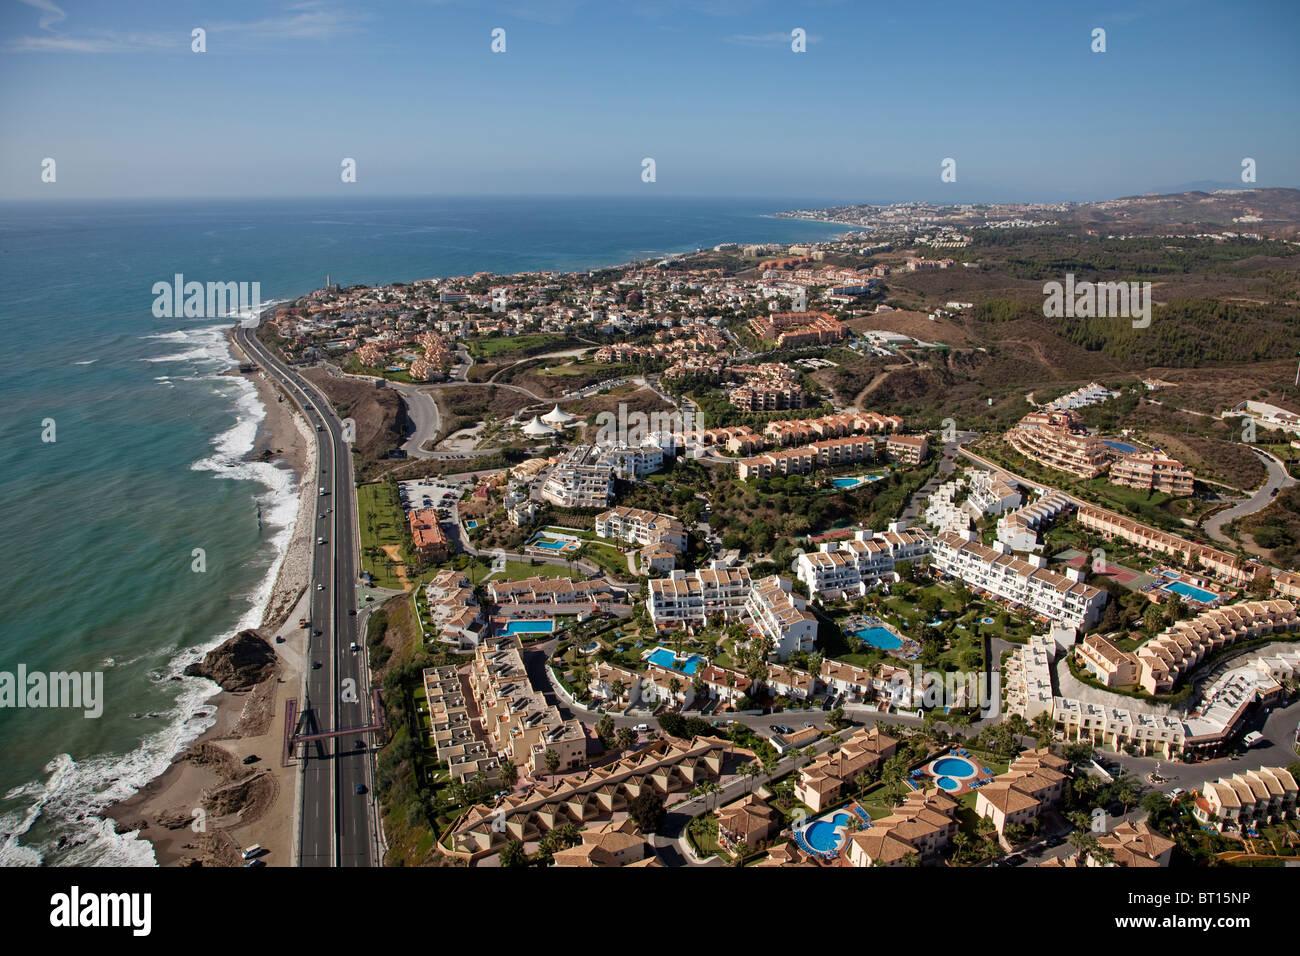 Vista aerea de mijas costa m laga costa del sol andaluc a - Fotografia aerea malaga ...